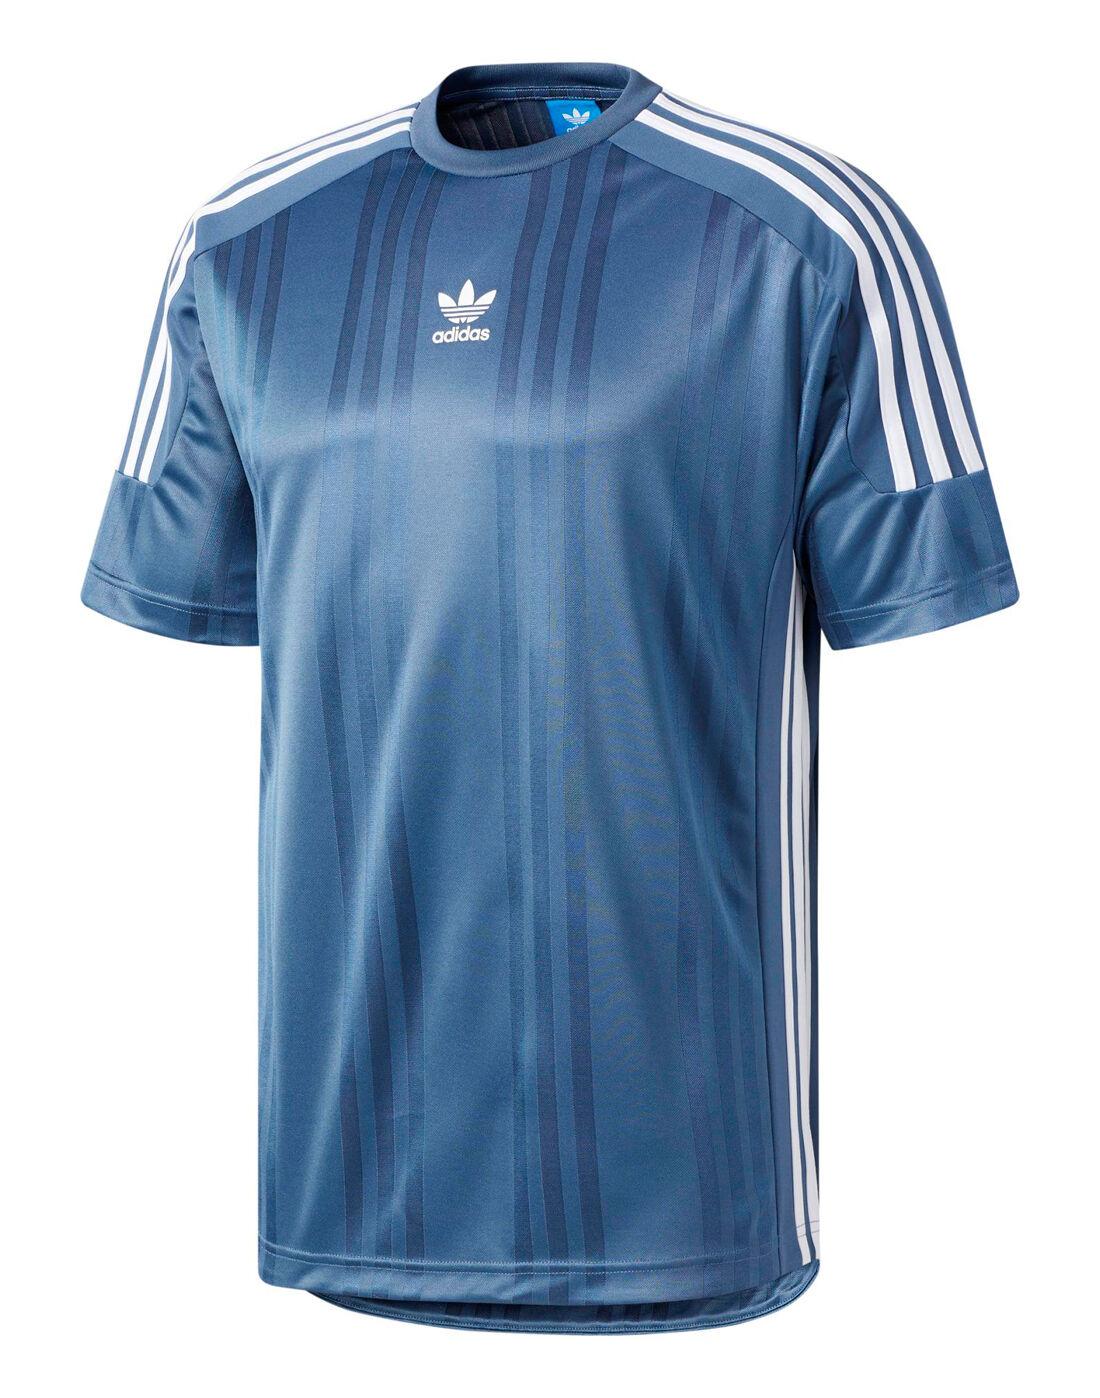 adidas originali mens jaq 3 strisce stile di vita sportiva, new jersey